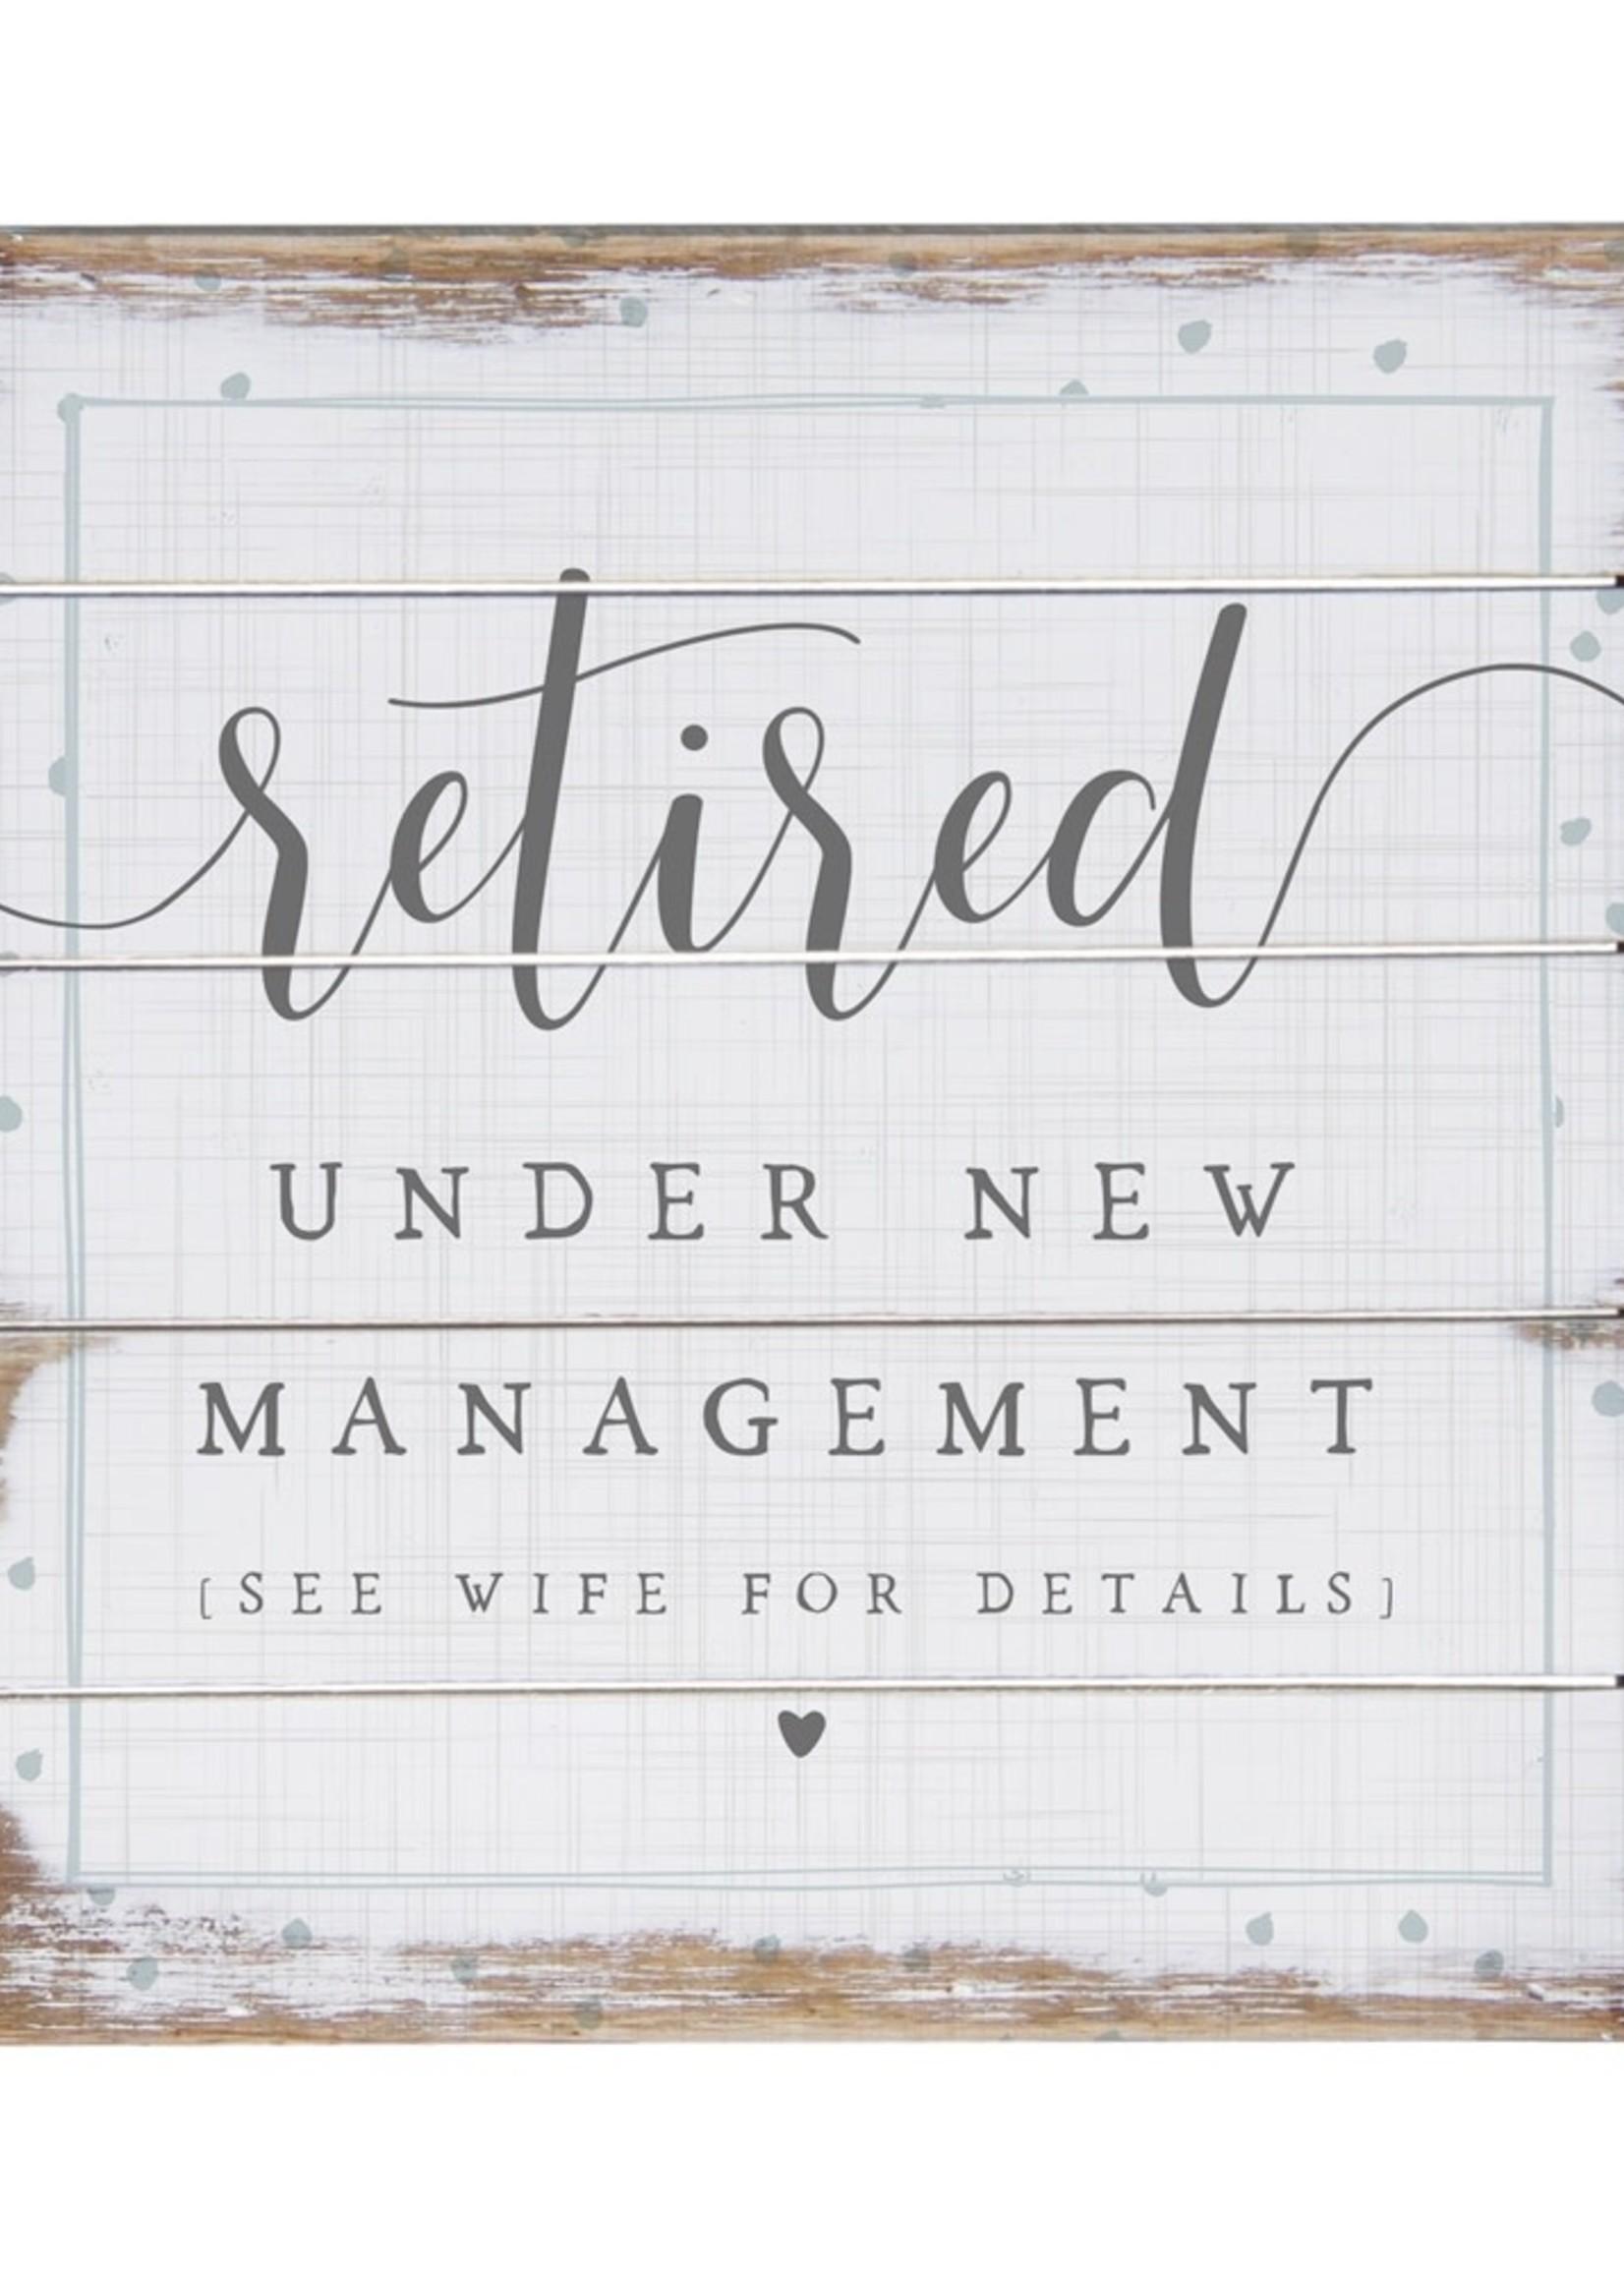 Retired Management